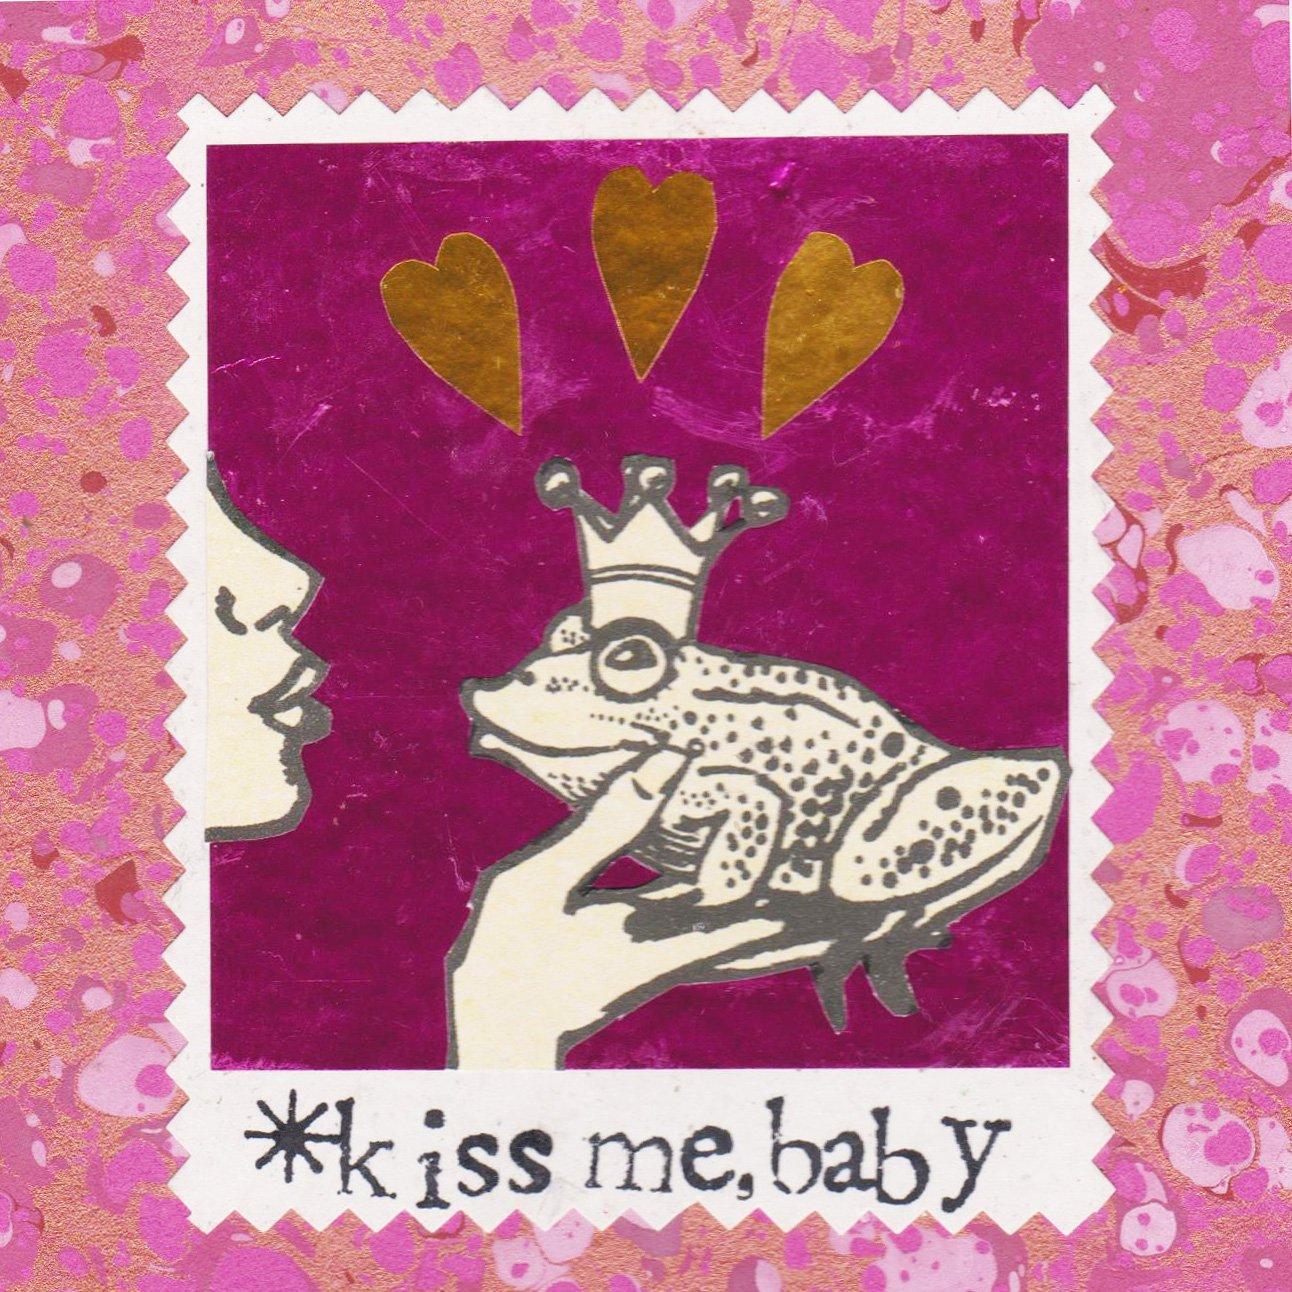 Image of Kiss me, baby  #2613